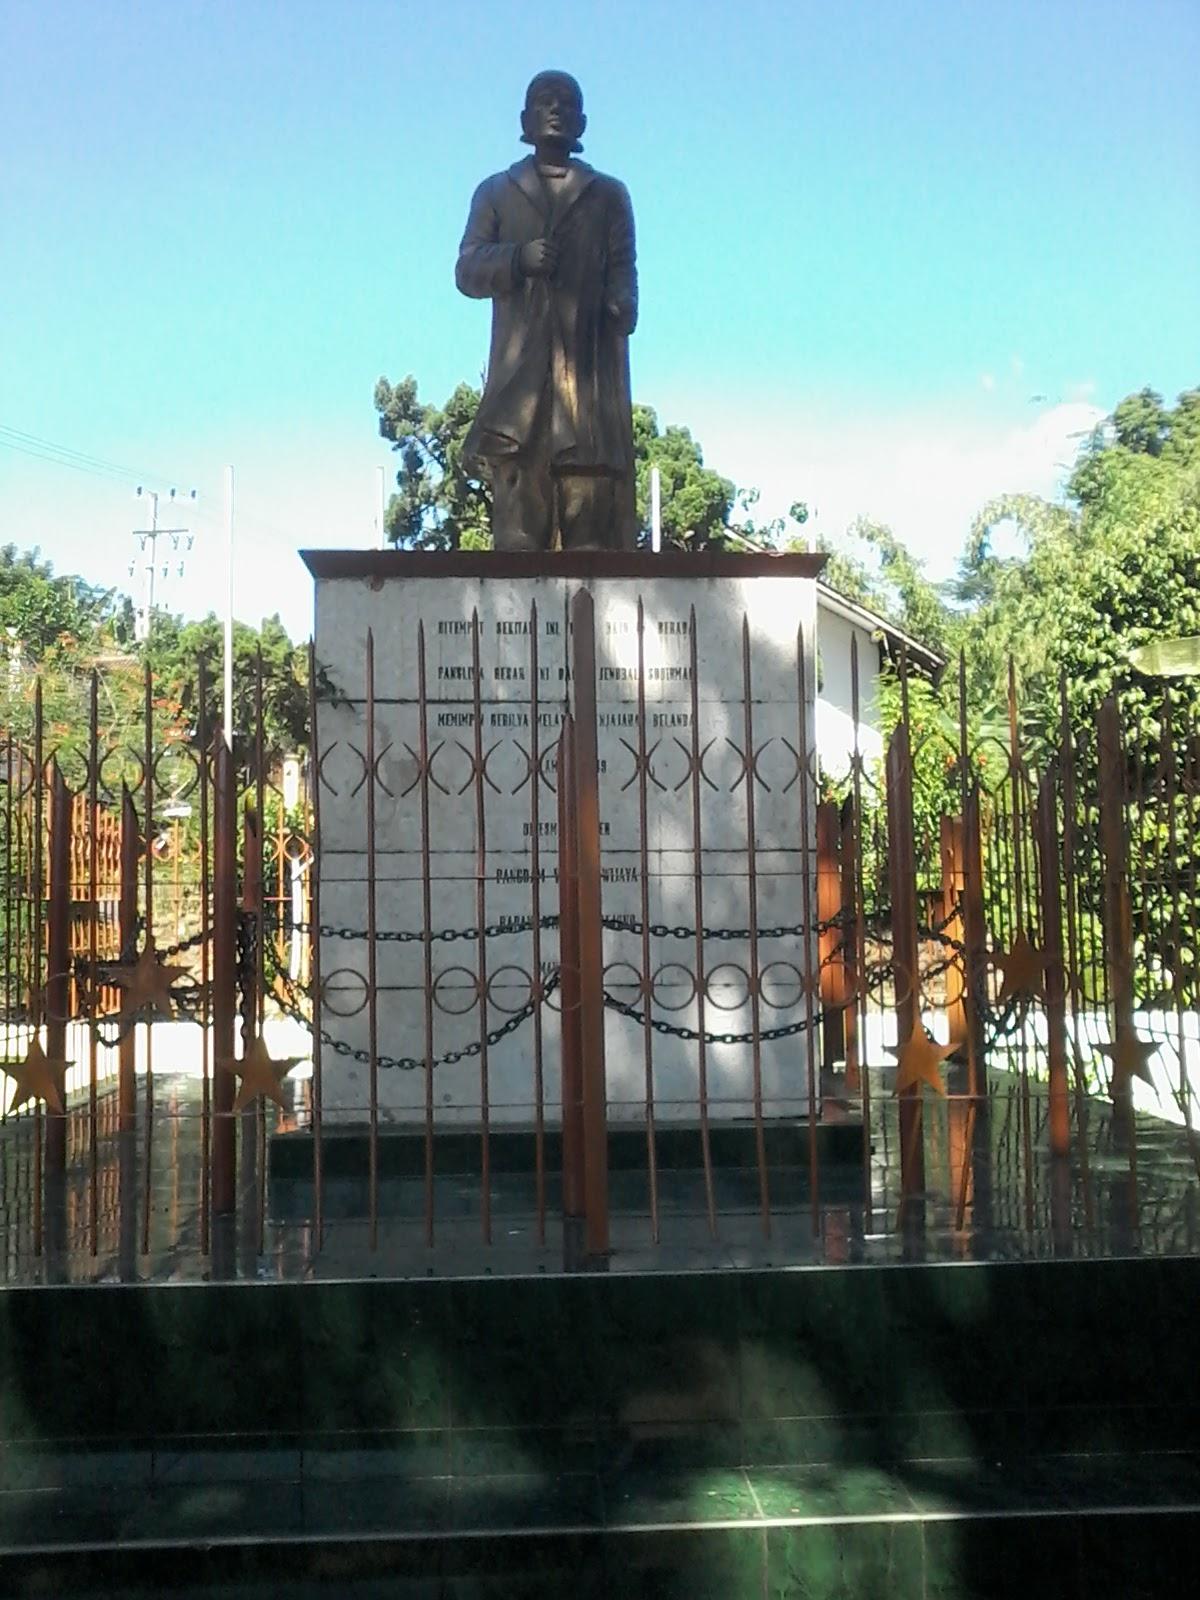 Menilik Jejak Gerilya Panglima Besar Jendral Sudirman Catatan Monumen Geriliya